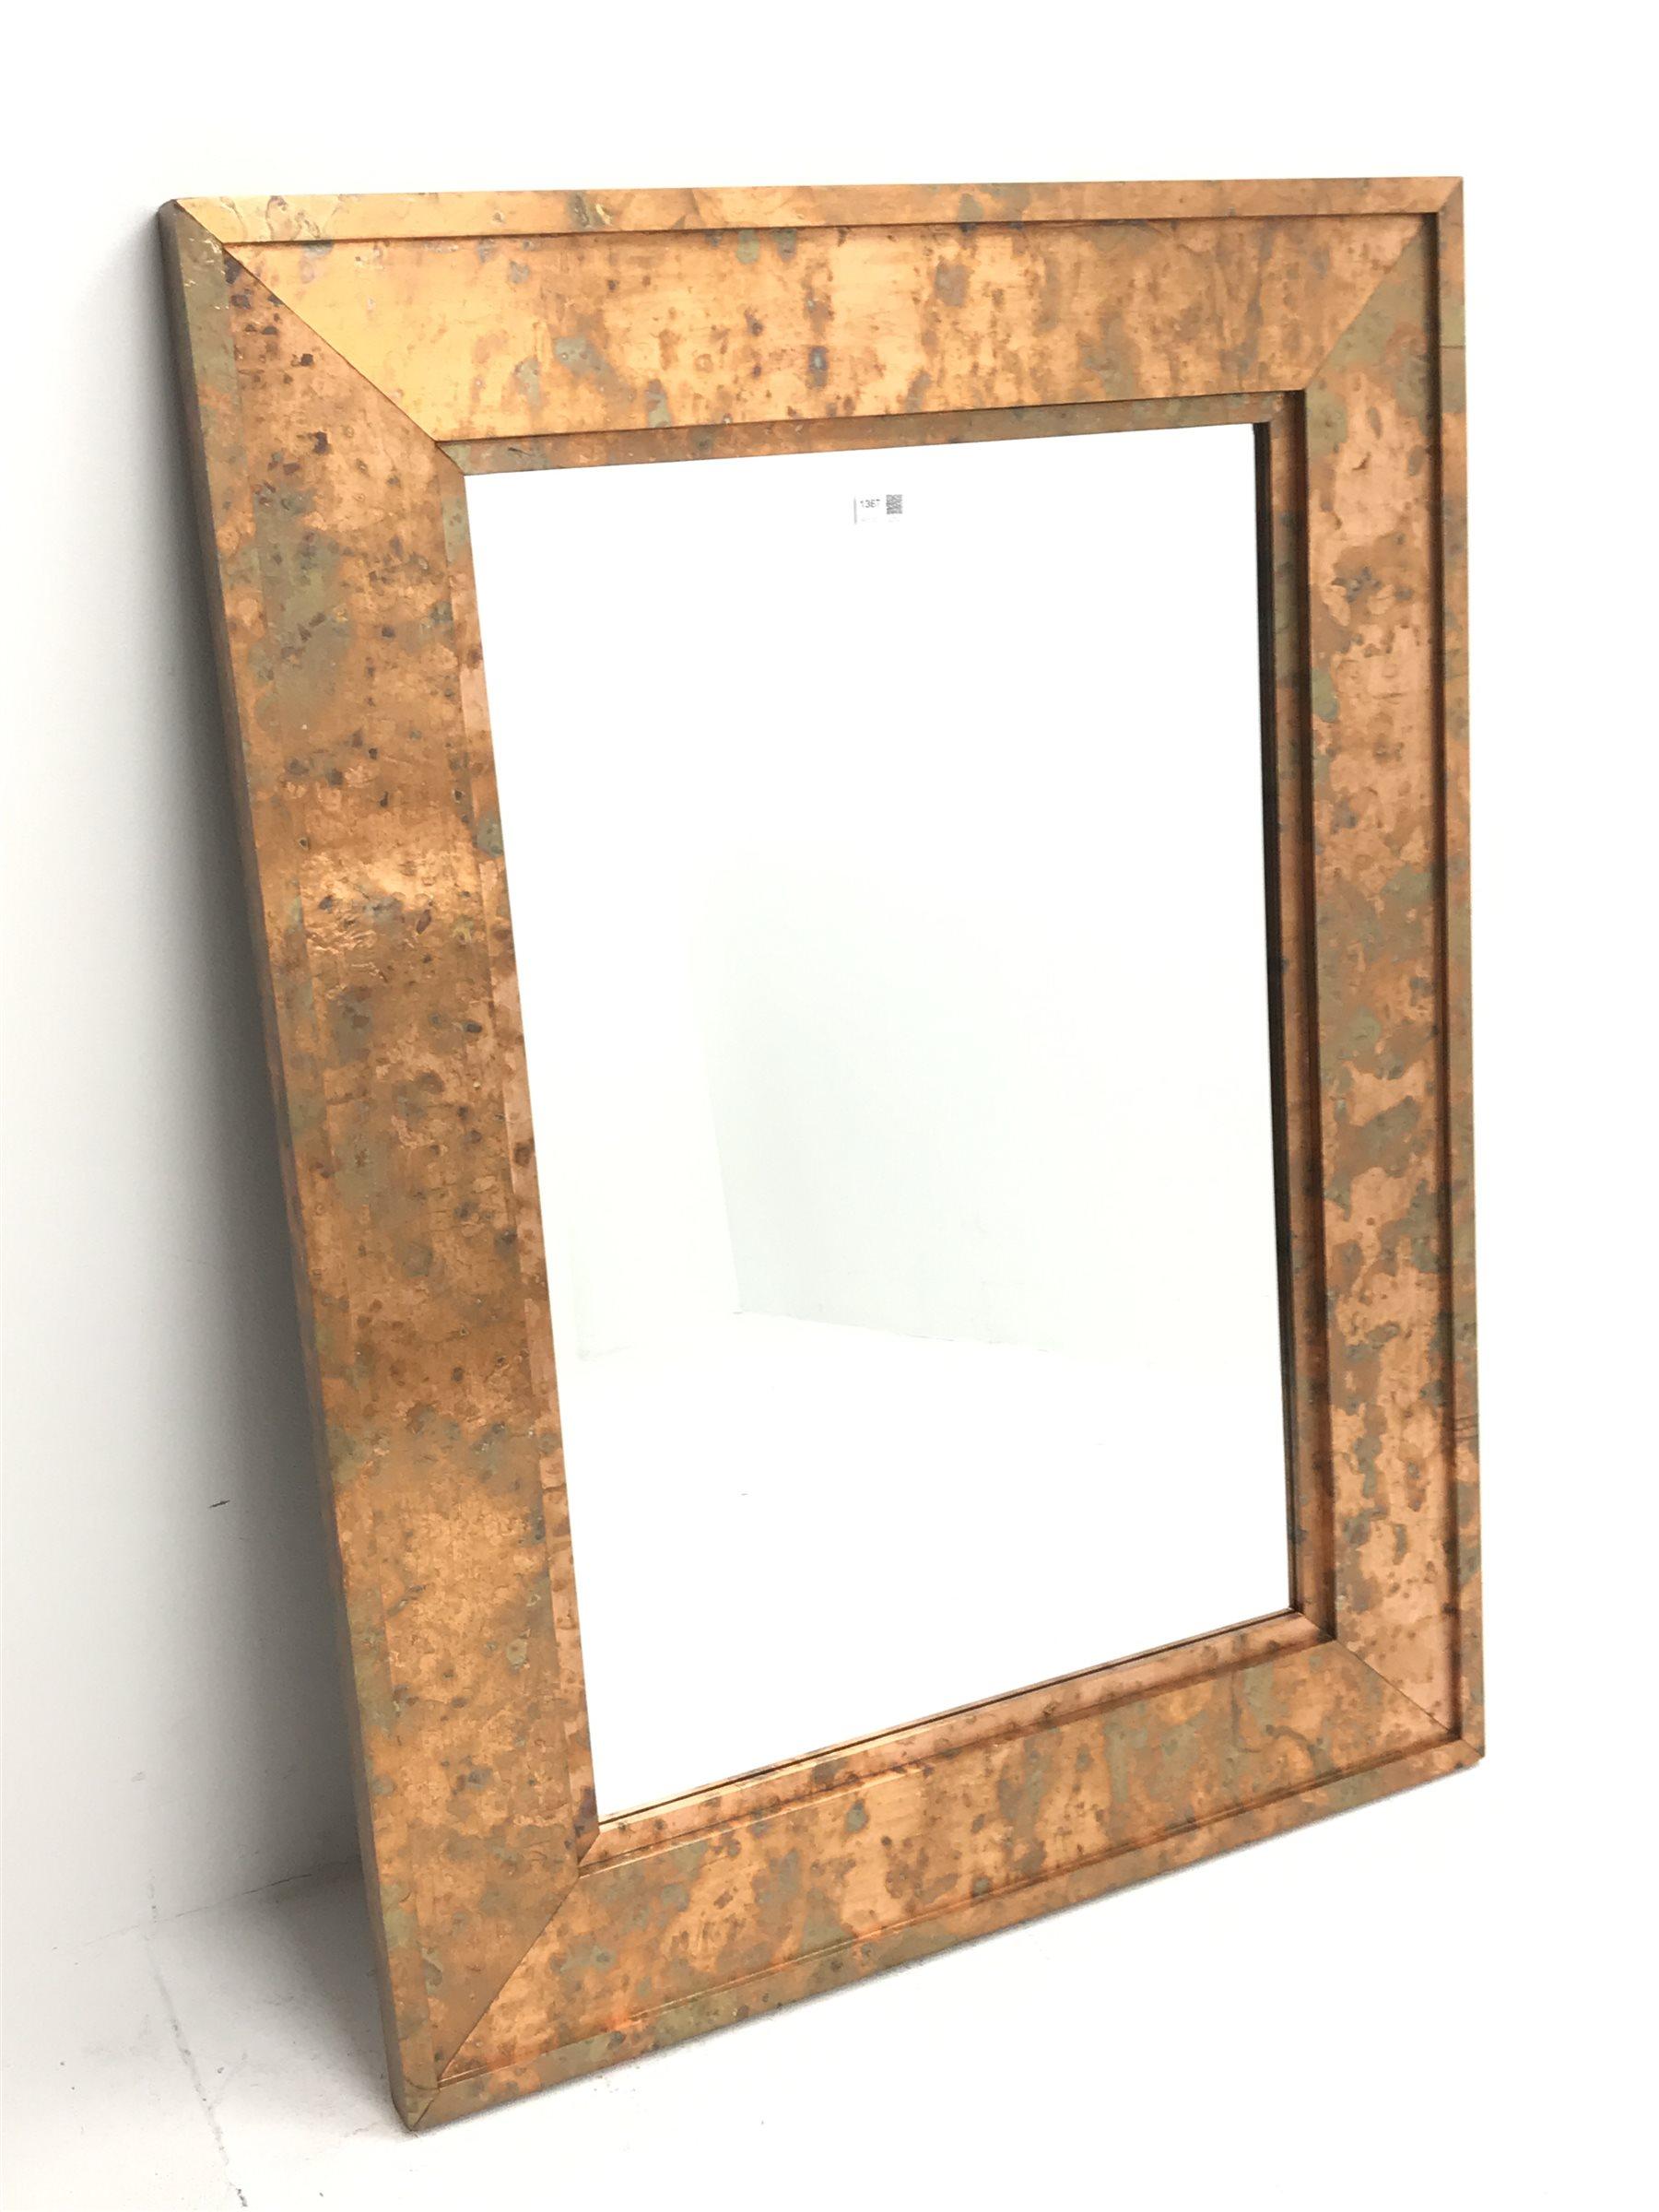 Acid washed copper framed rectangular wall mirror, bevelled plate, 91cm x 122cm